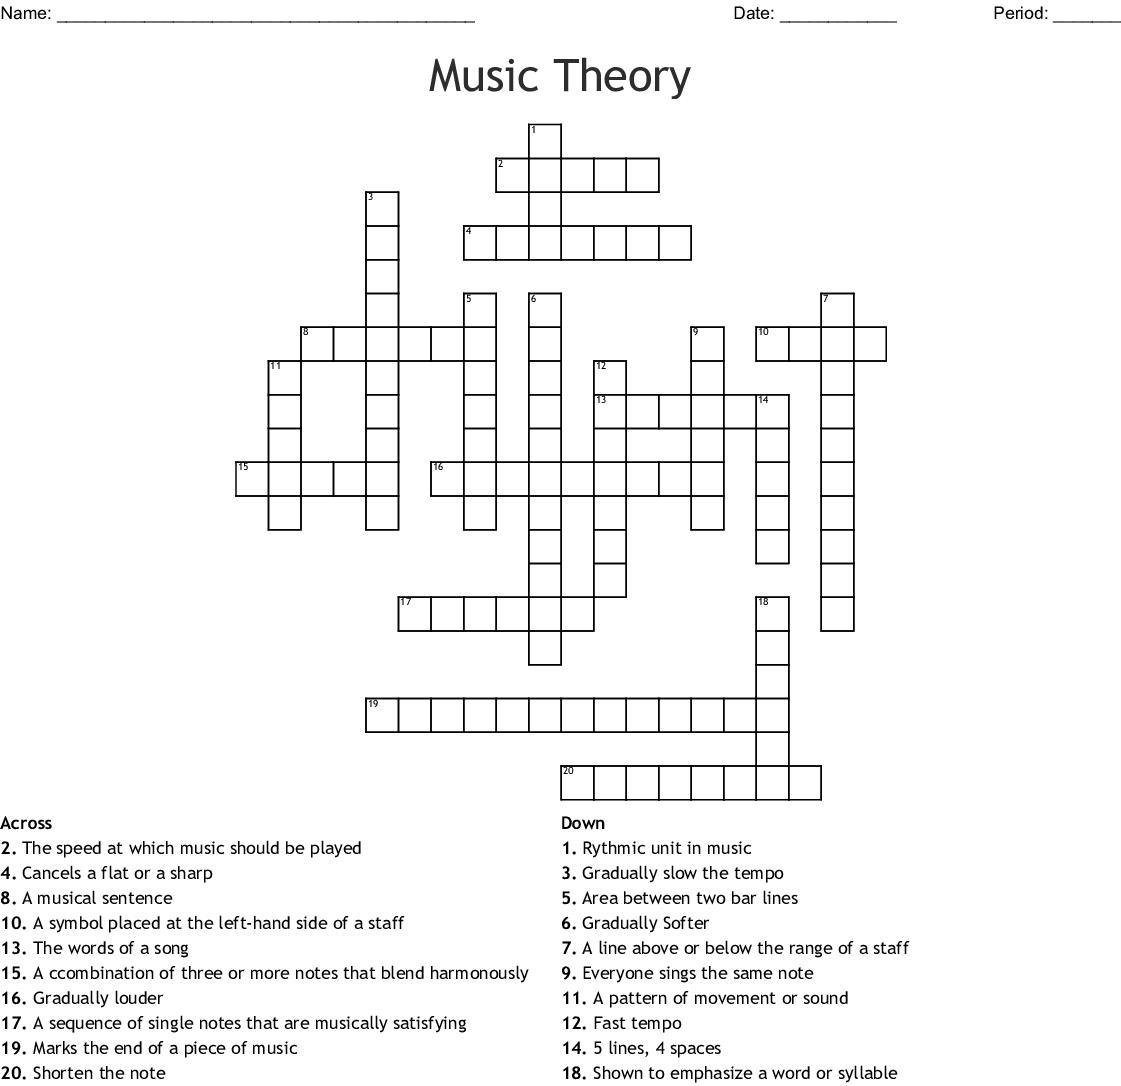 Music Theory Crossword - Wordmint - Music Crossword Puzzles Printable